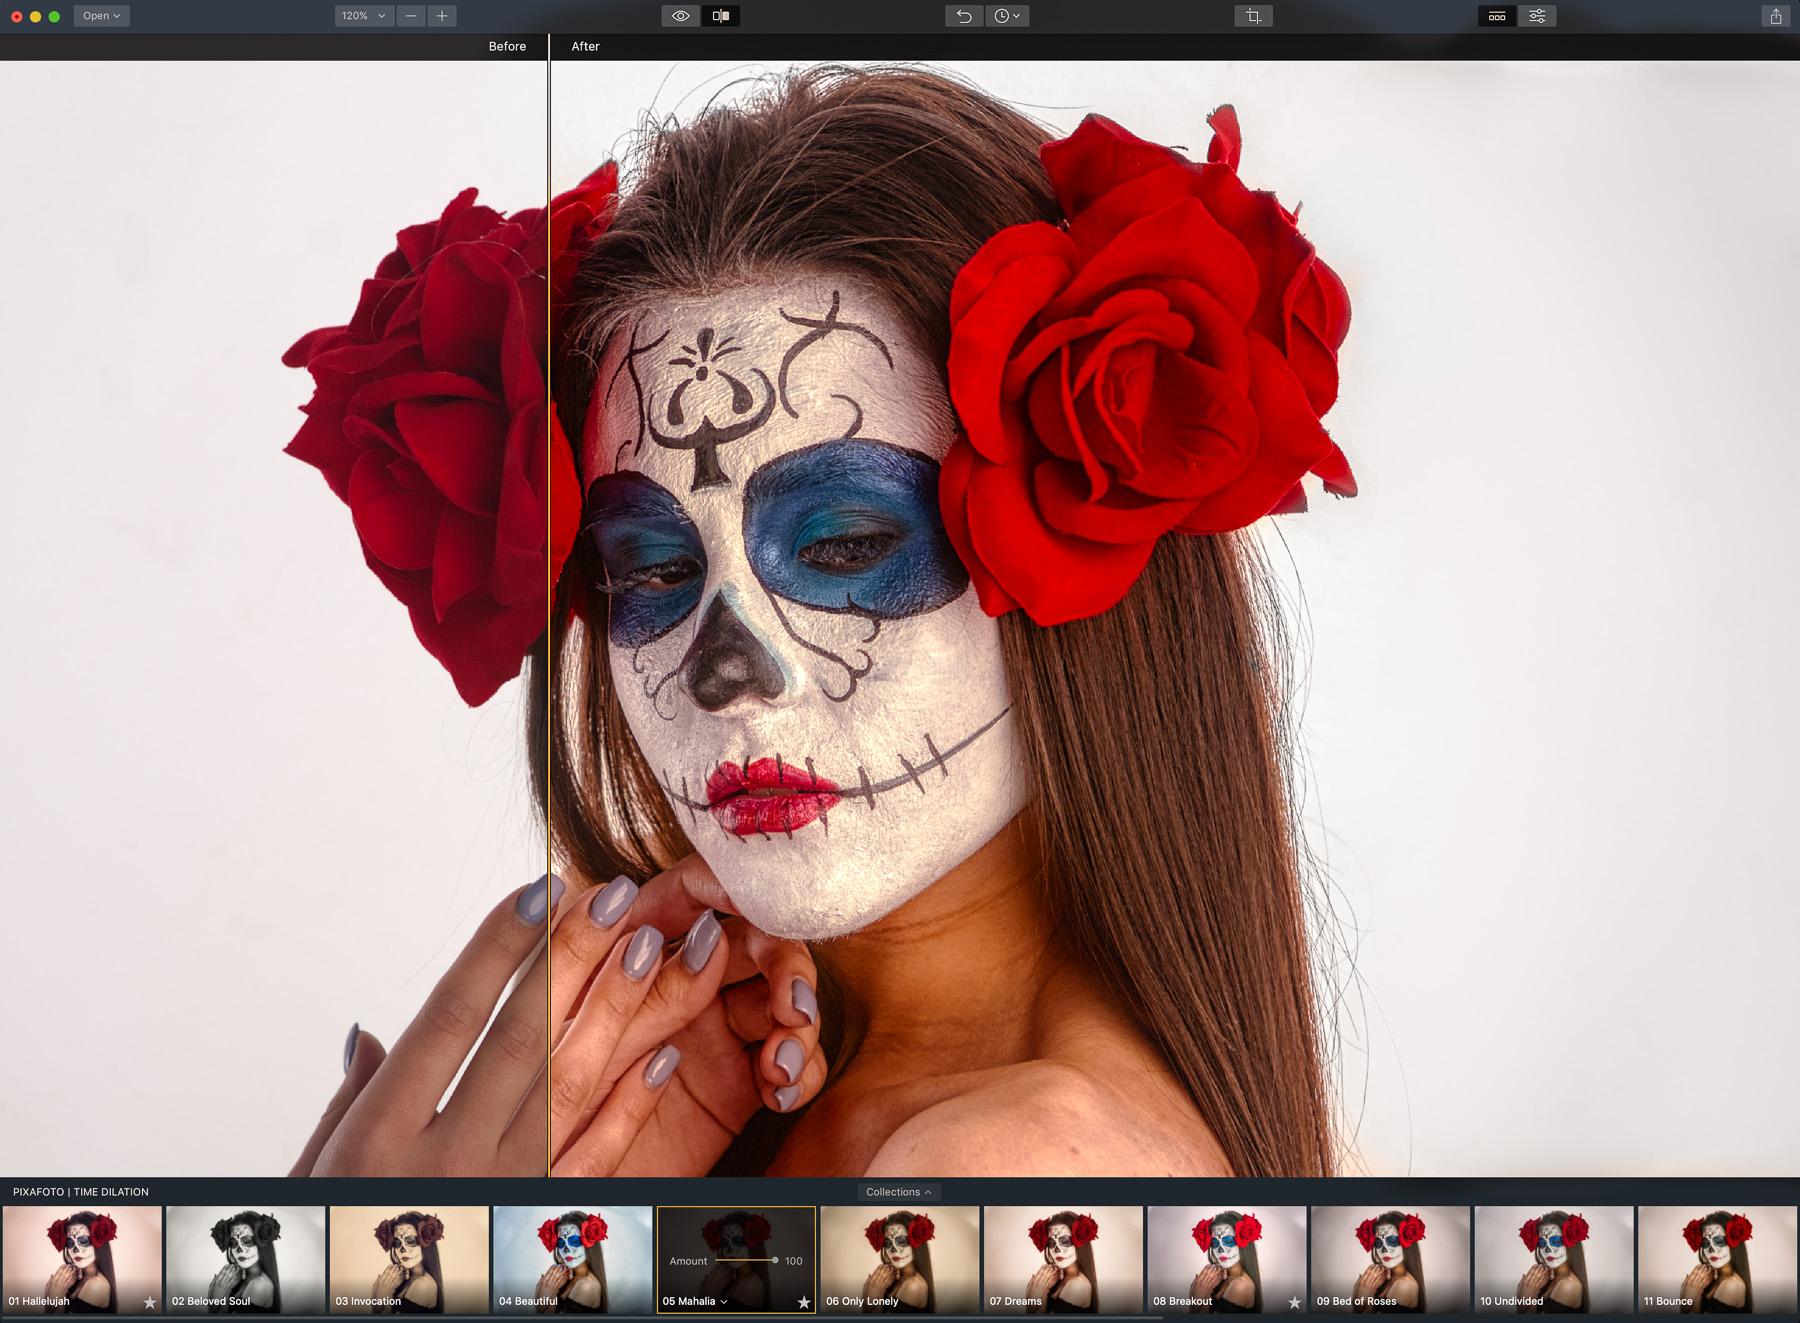 Aurora HDR 2019 Dragan Style HDR Portraiture - Free Samples